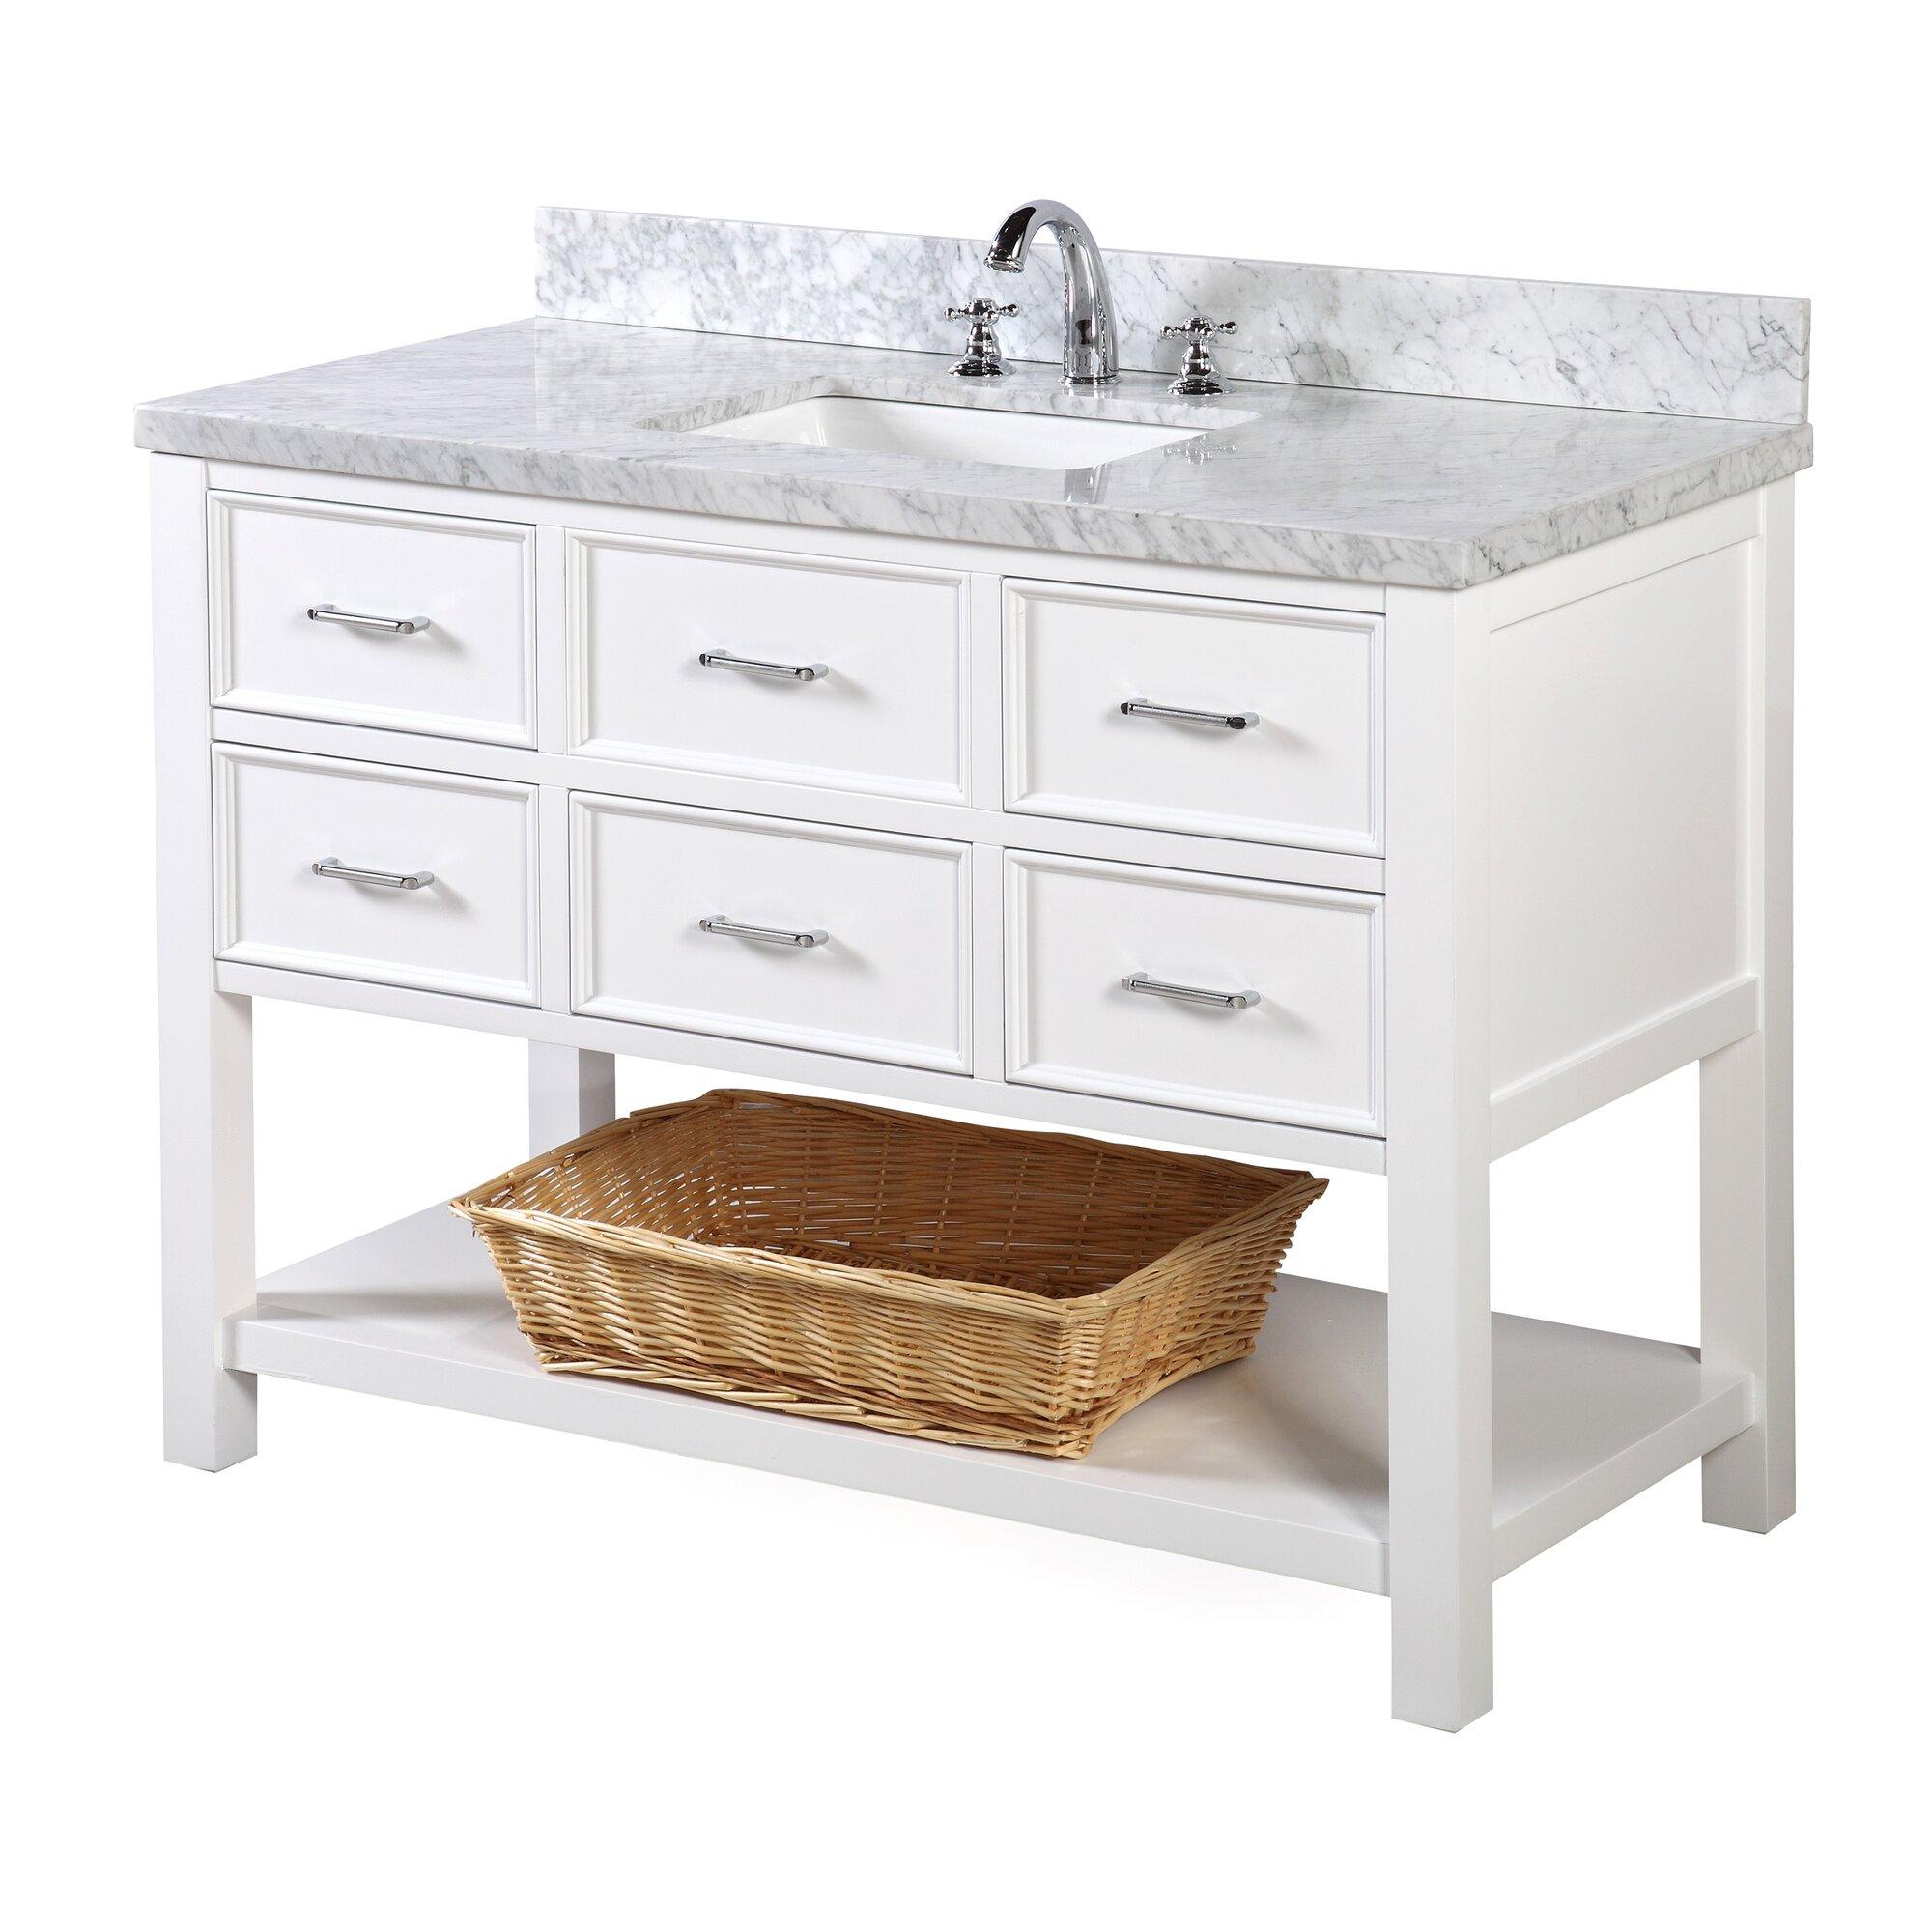 New Hshire 48 Single Bathroom Vanity Set